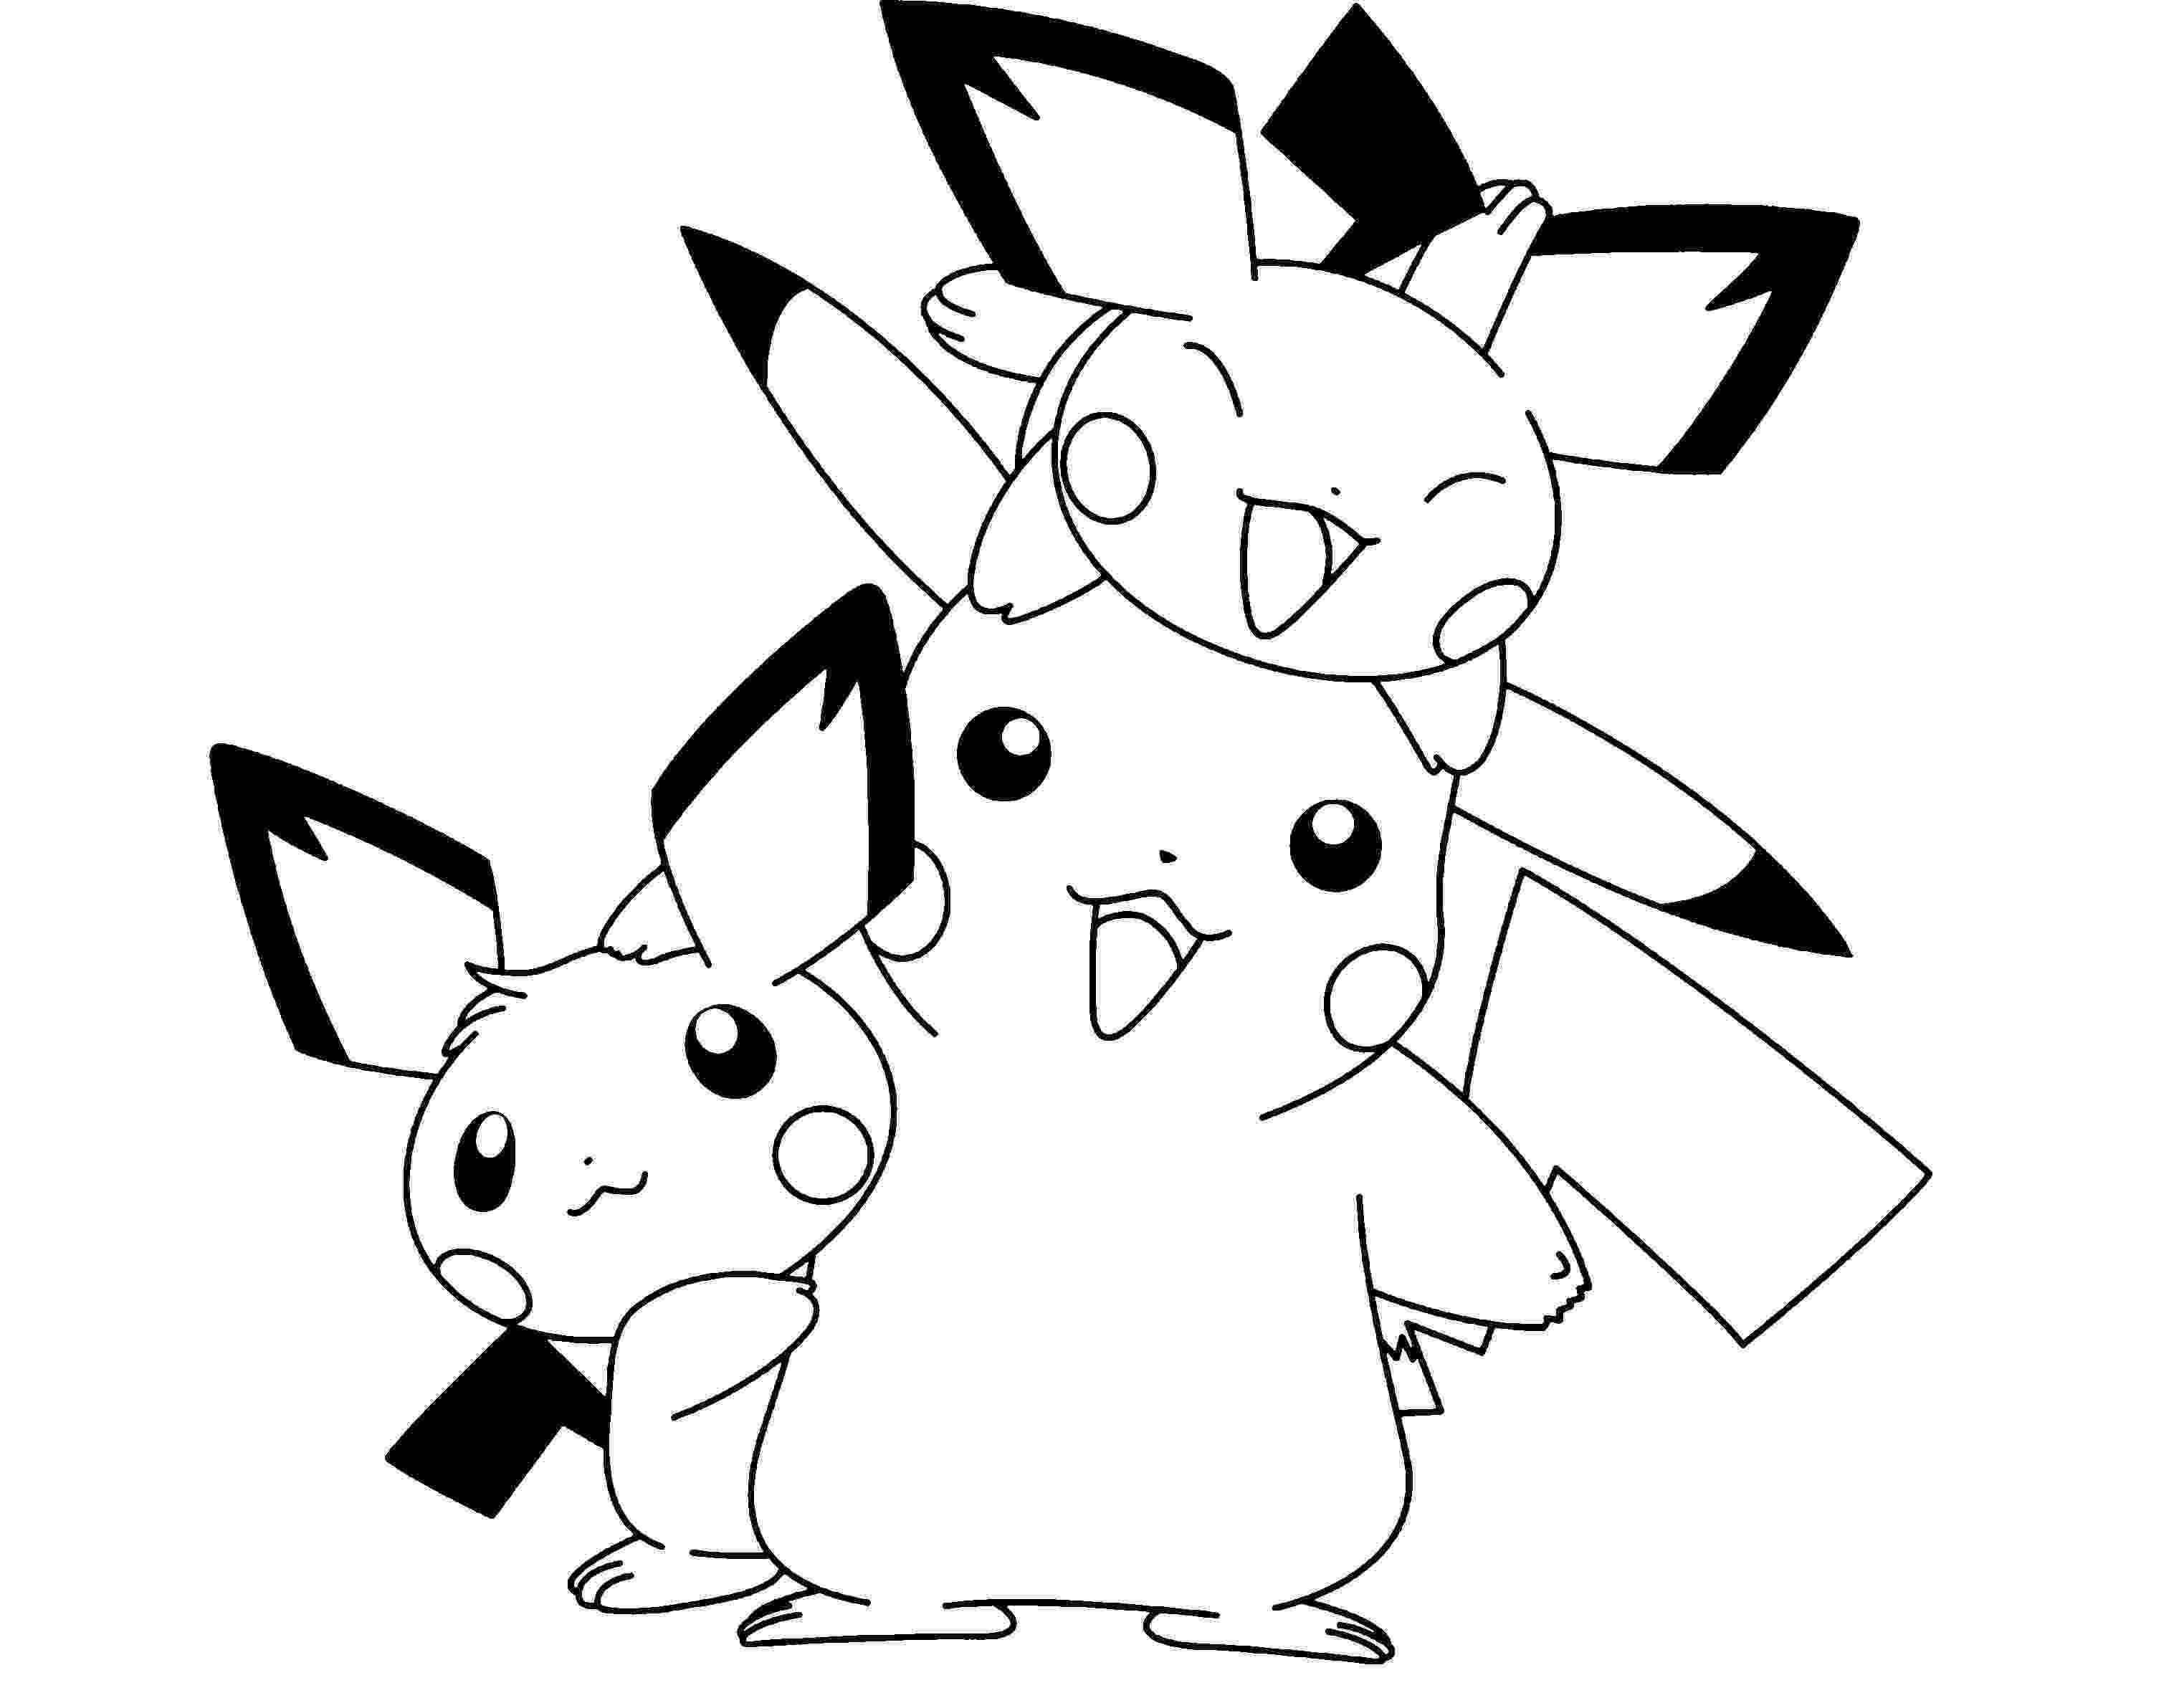 pikachu coloring sheet printable pikachu coloring pages for kids cool2bkids coloring pikachu sheet